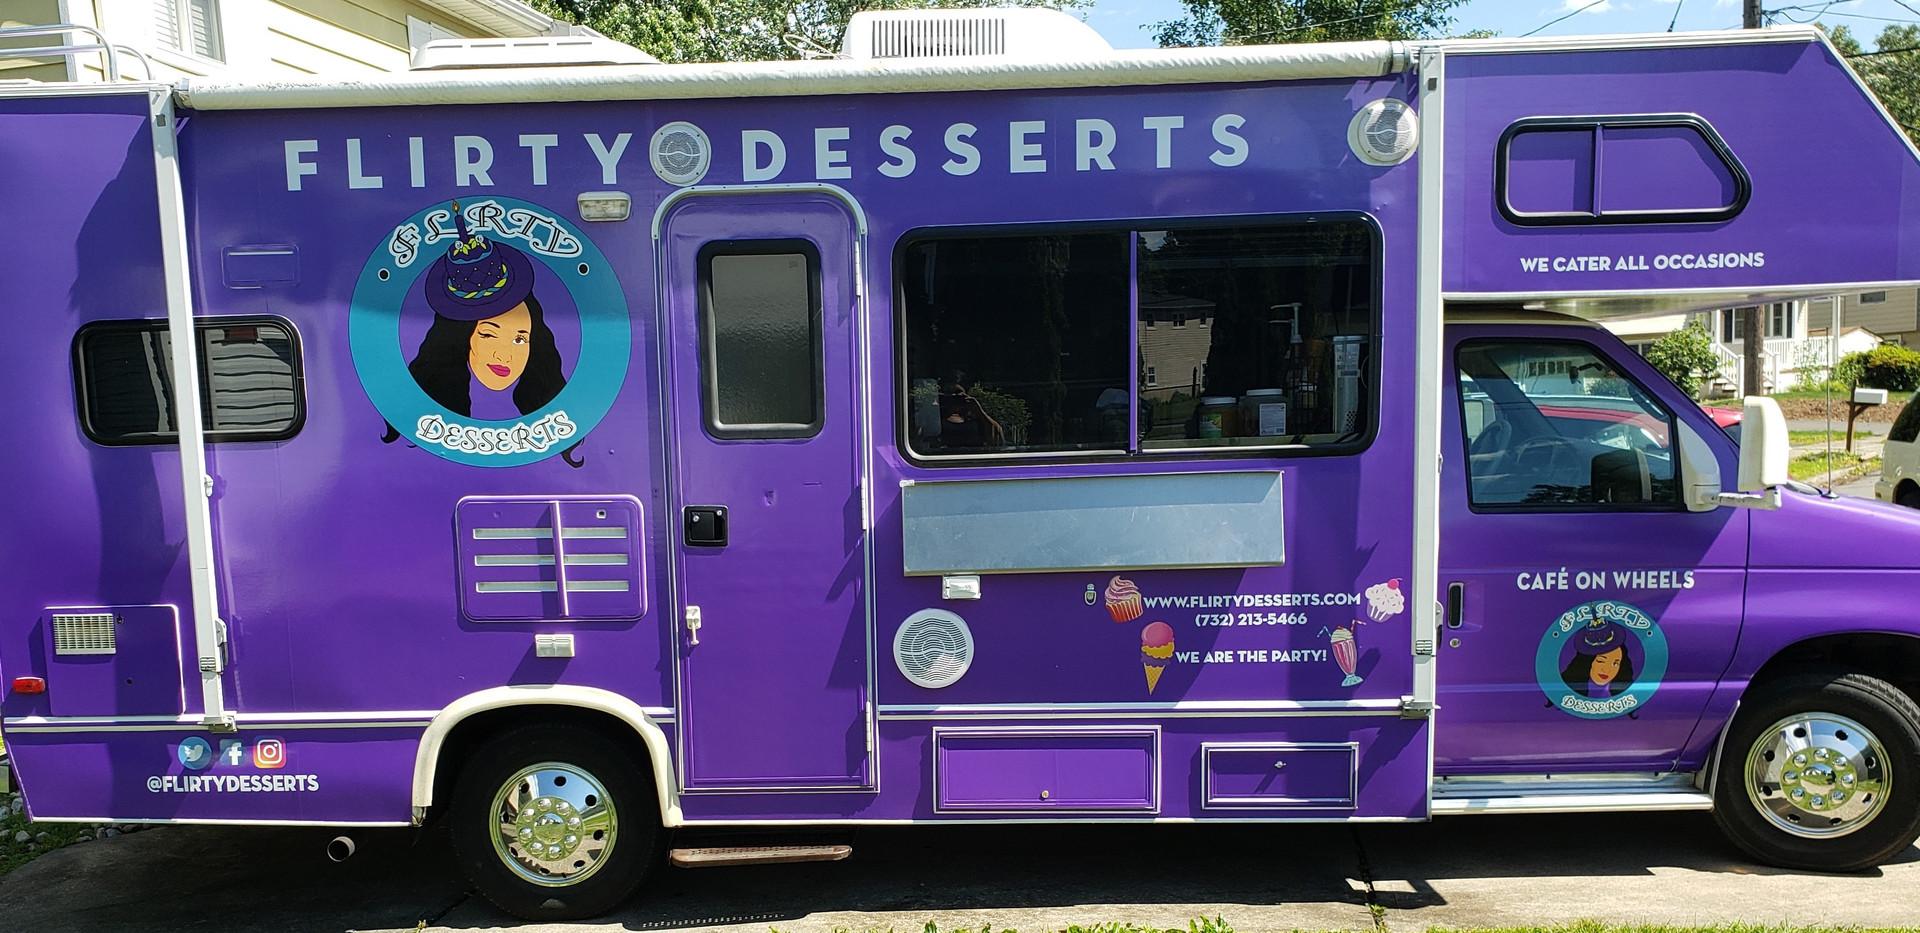 Flirty Desserts' Truck